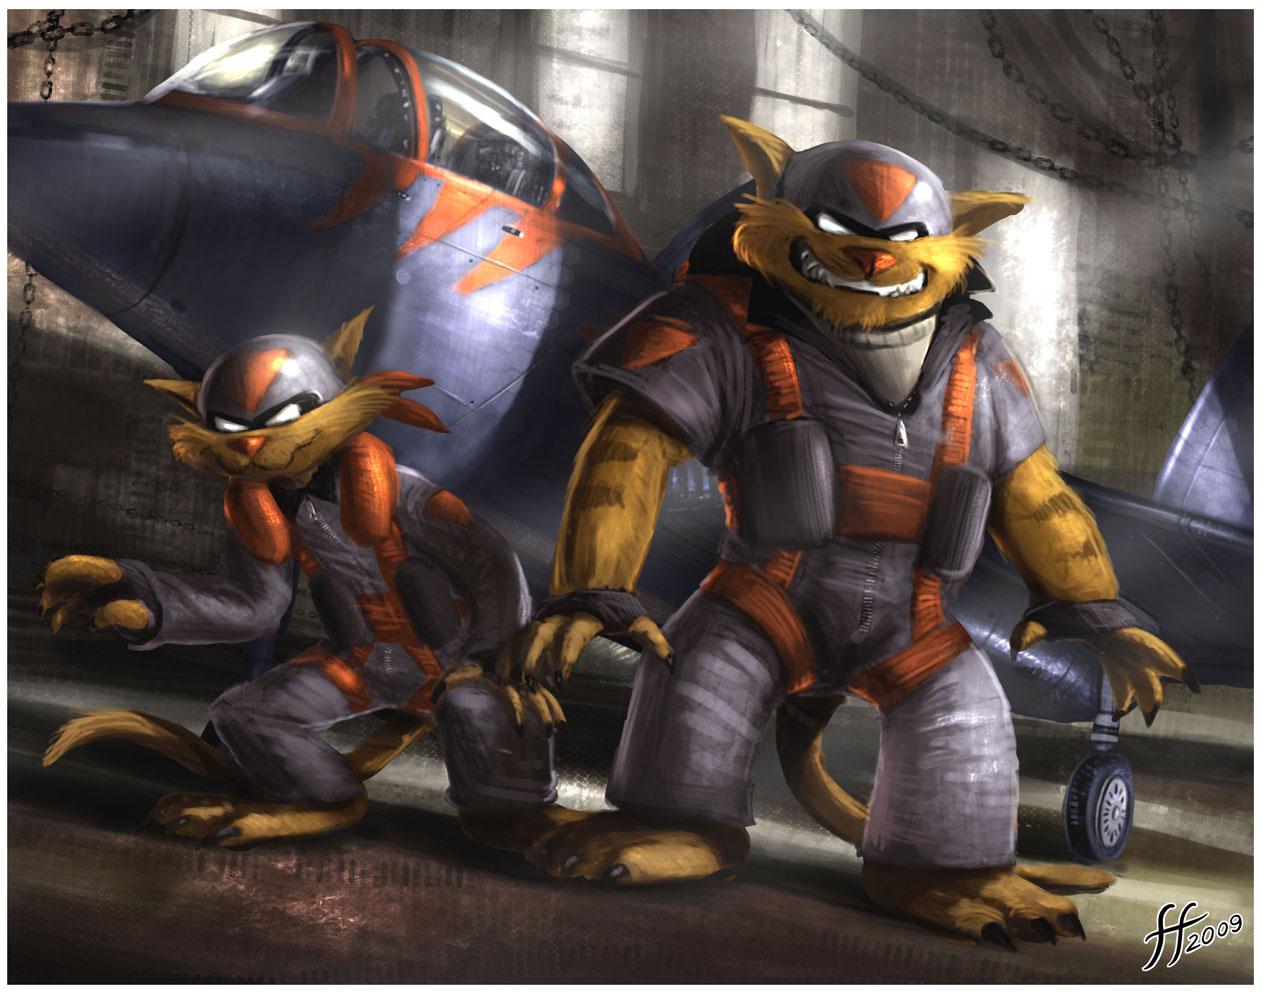 Swat Kats Wallpaper